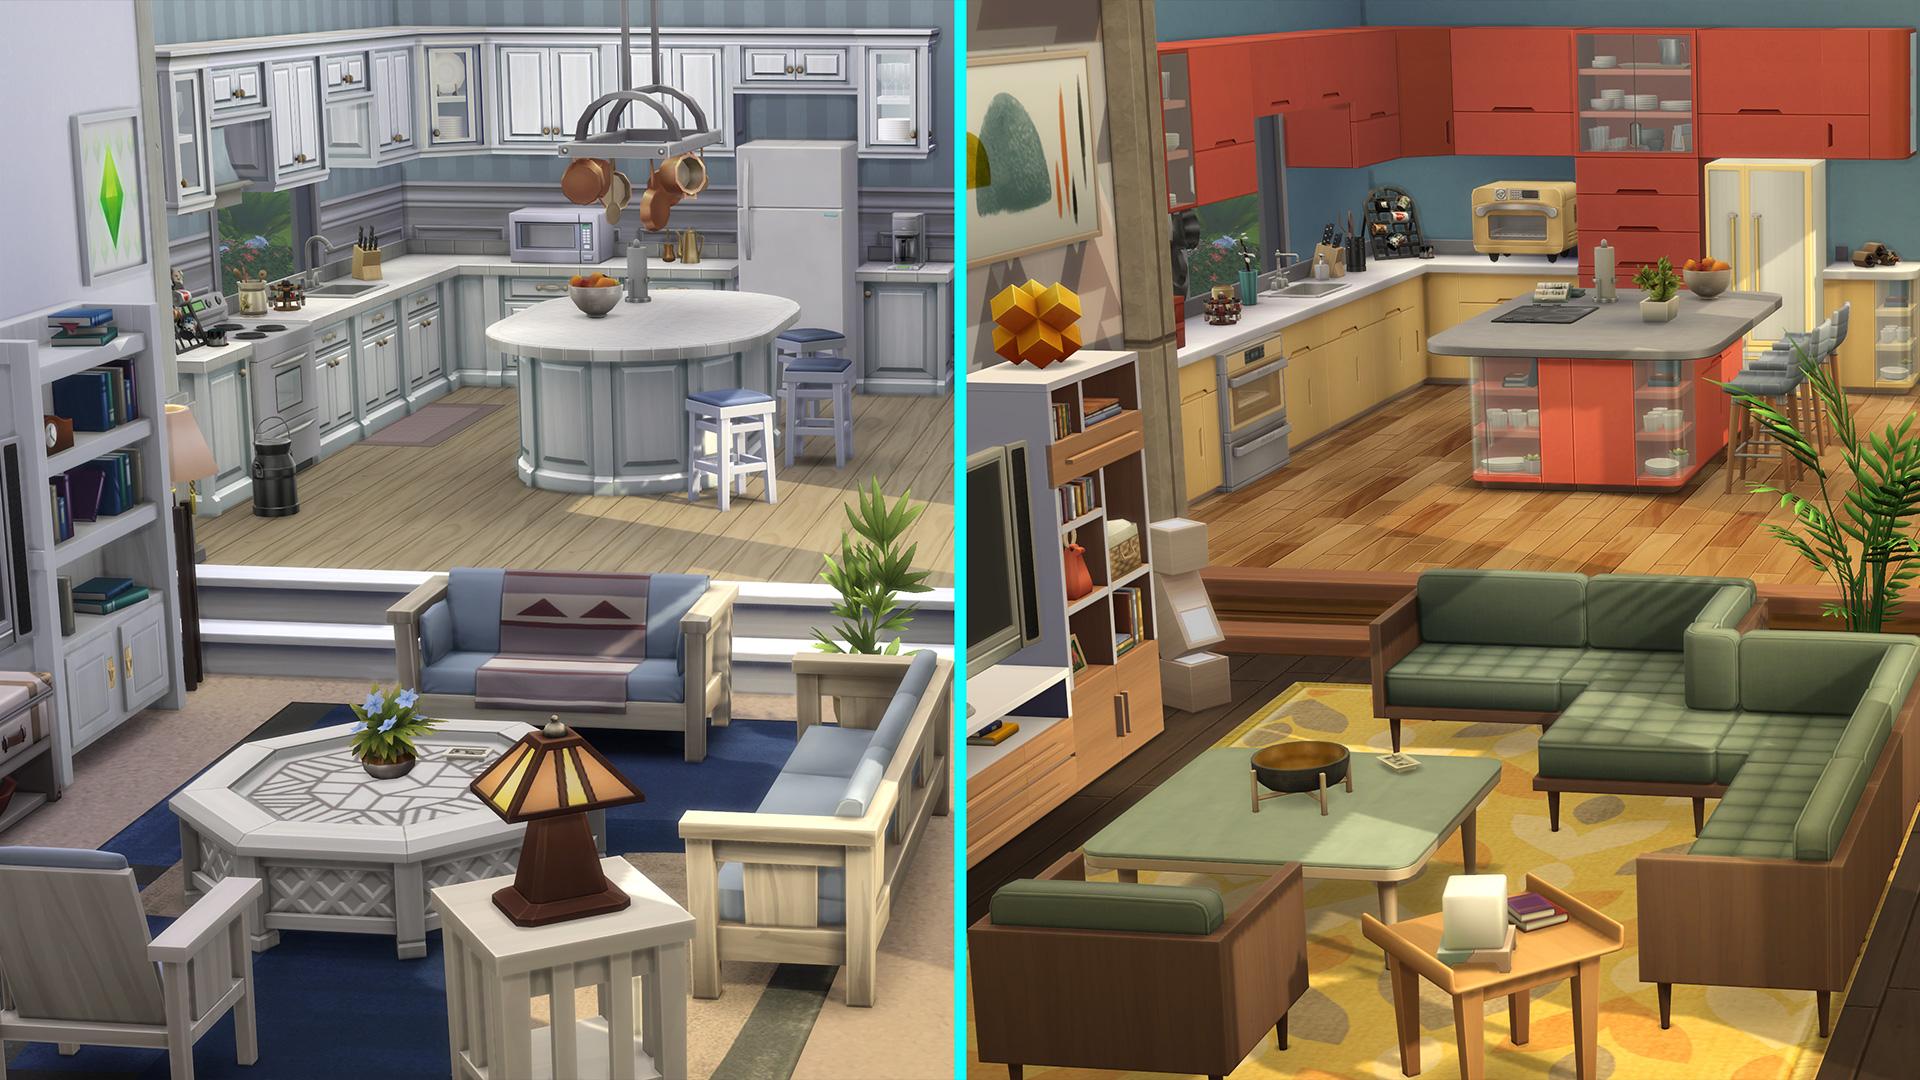 Die Sims 21 Traumhaftes Innendesign angekündigt   SimTimes